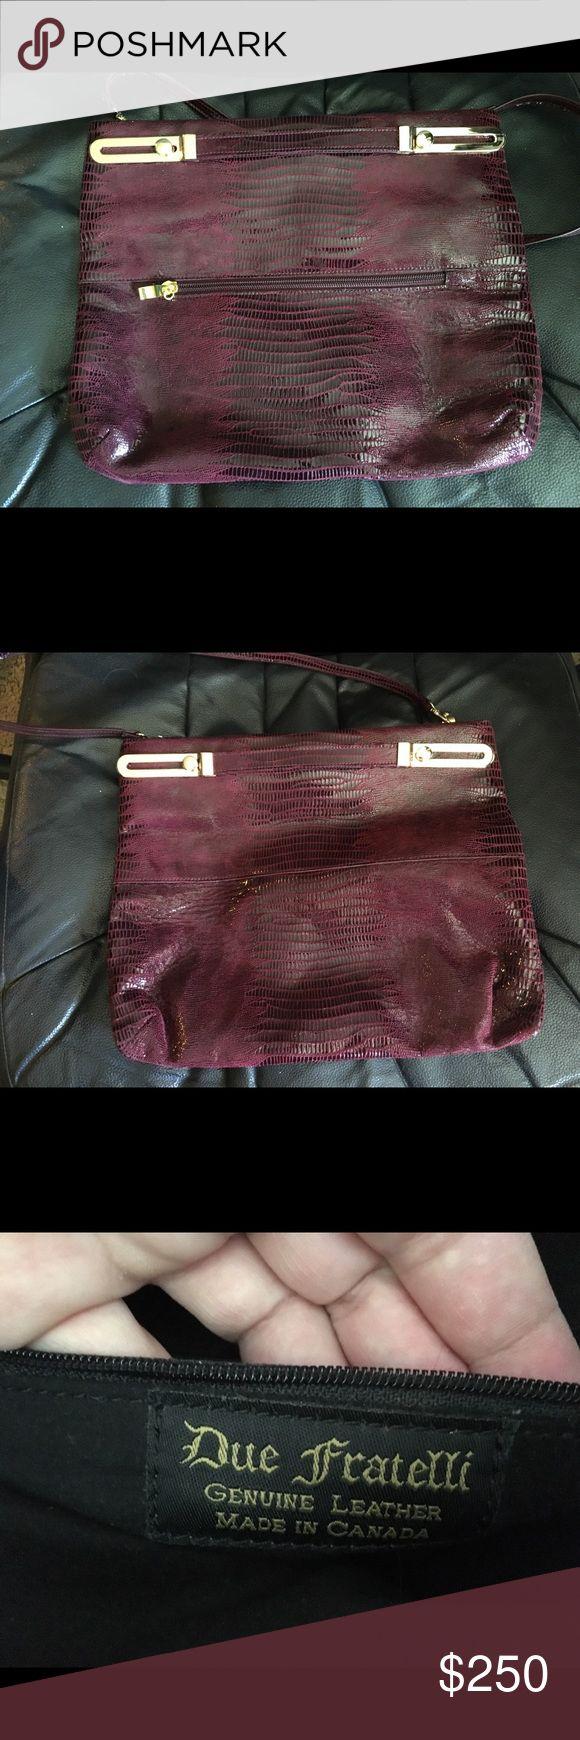 Selling this Due Fratelli genuine hand bag/clutch- wine on Poshmark! My username is: edp1983. #shopmycloset #poshmark #fashion #shopping #style #forsale #Due Fratelli #Handbags